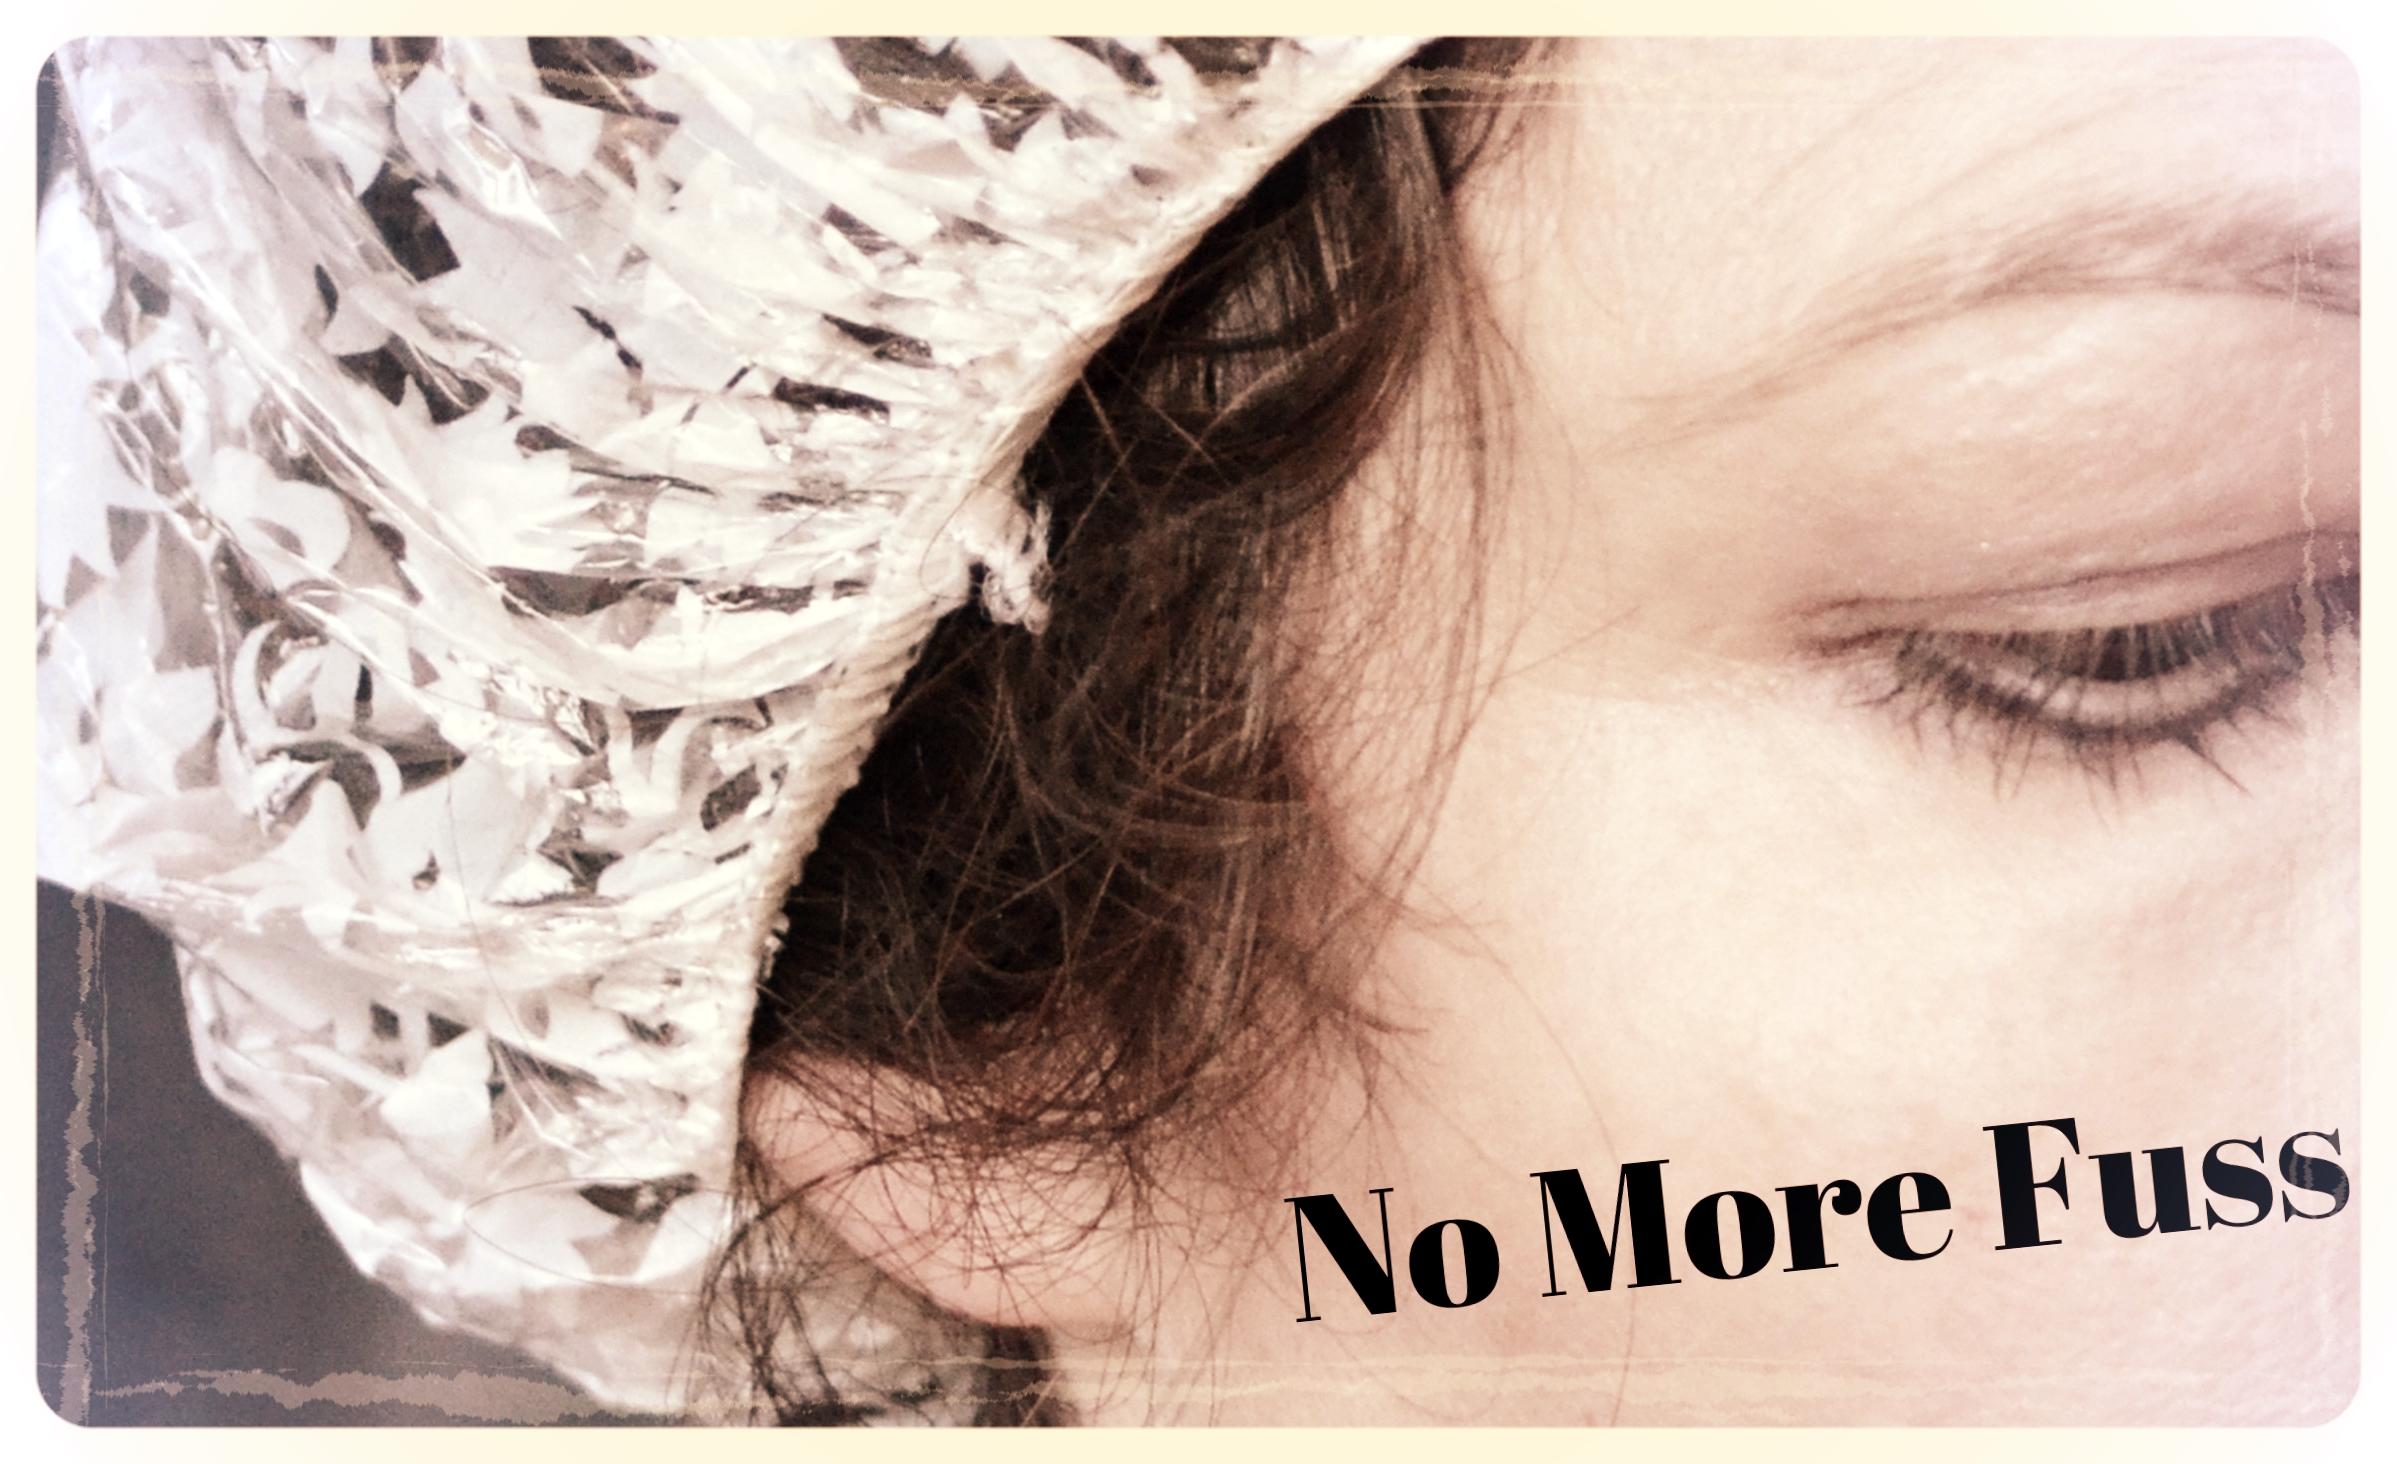 No More Fuss